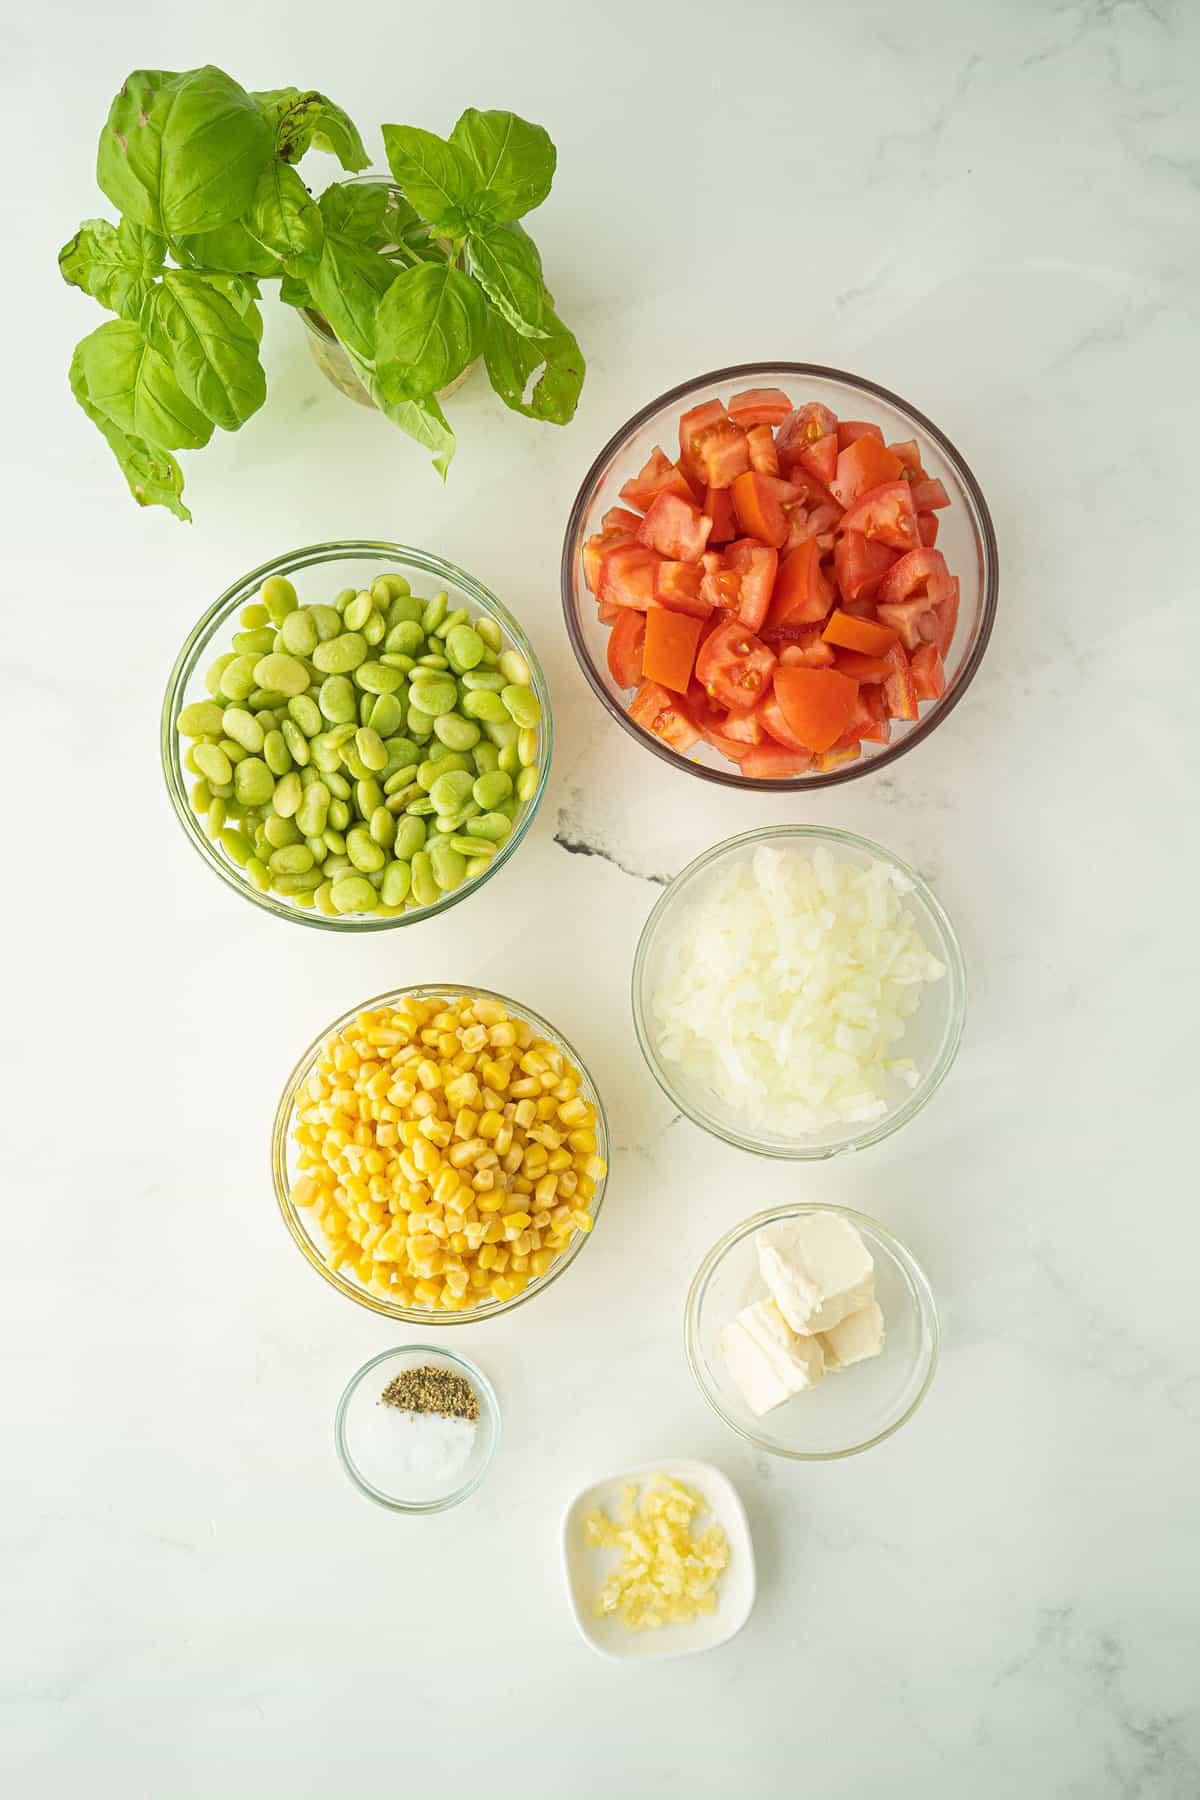 ingredients for succotash